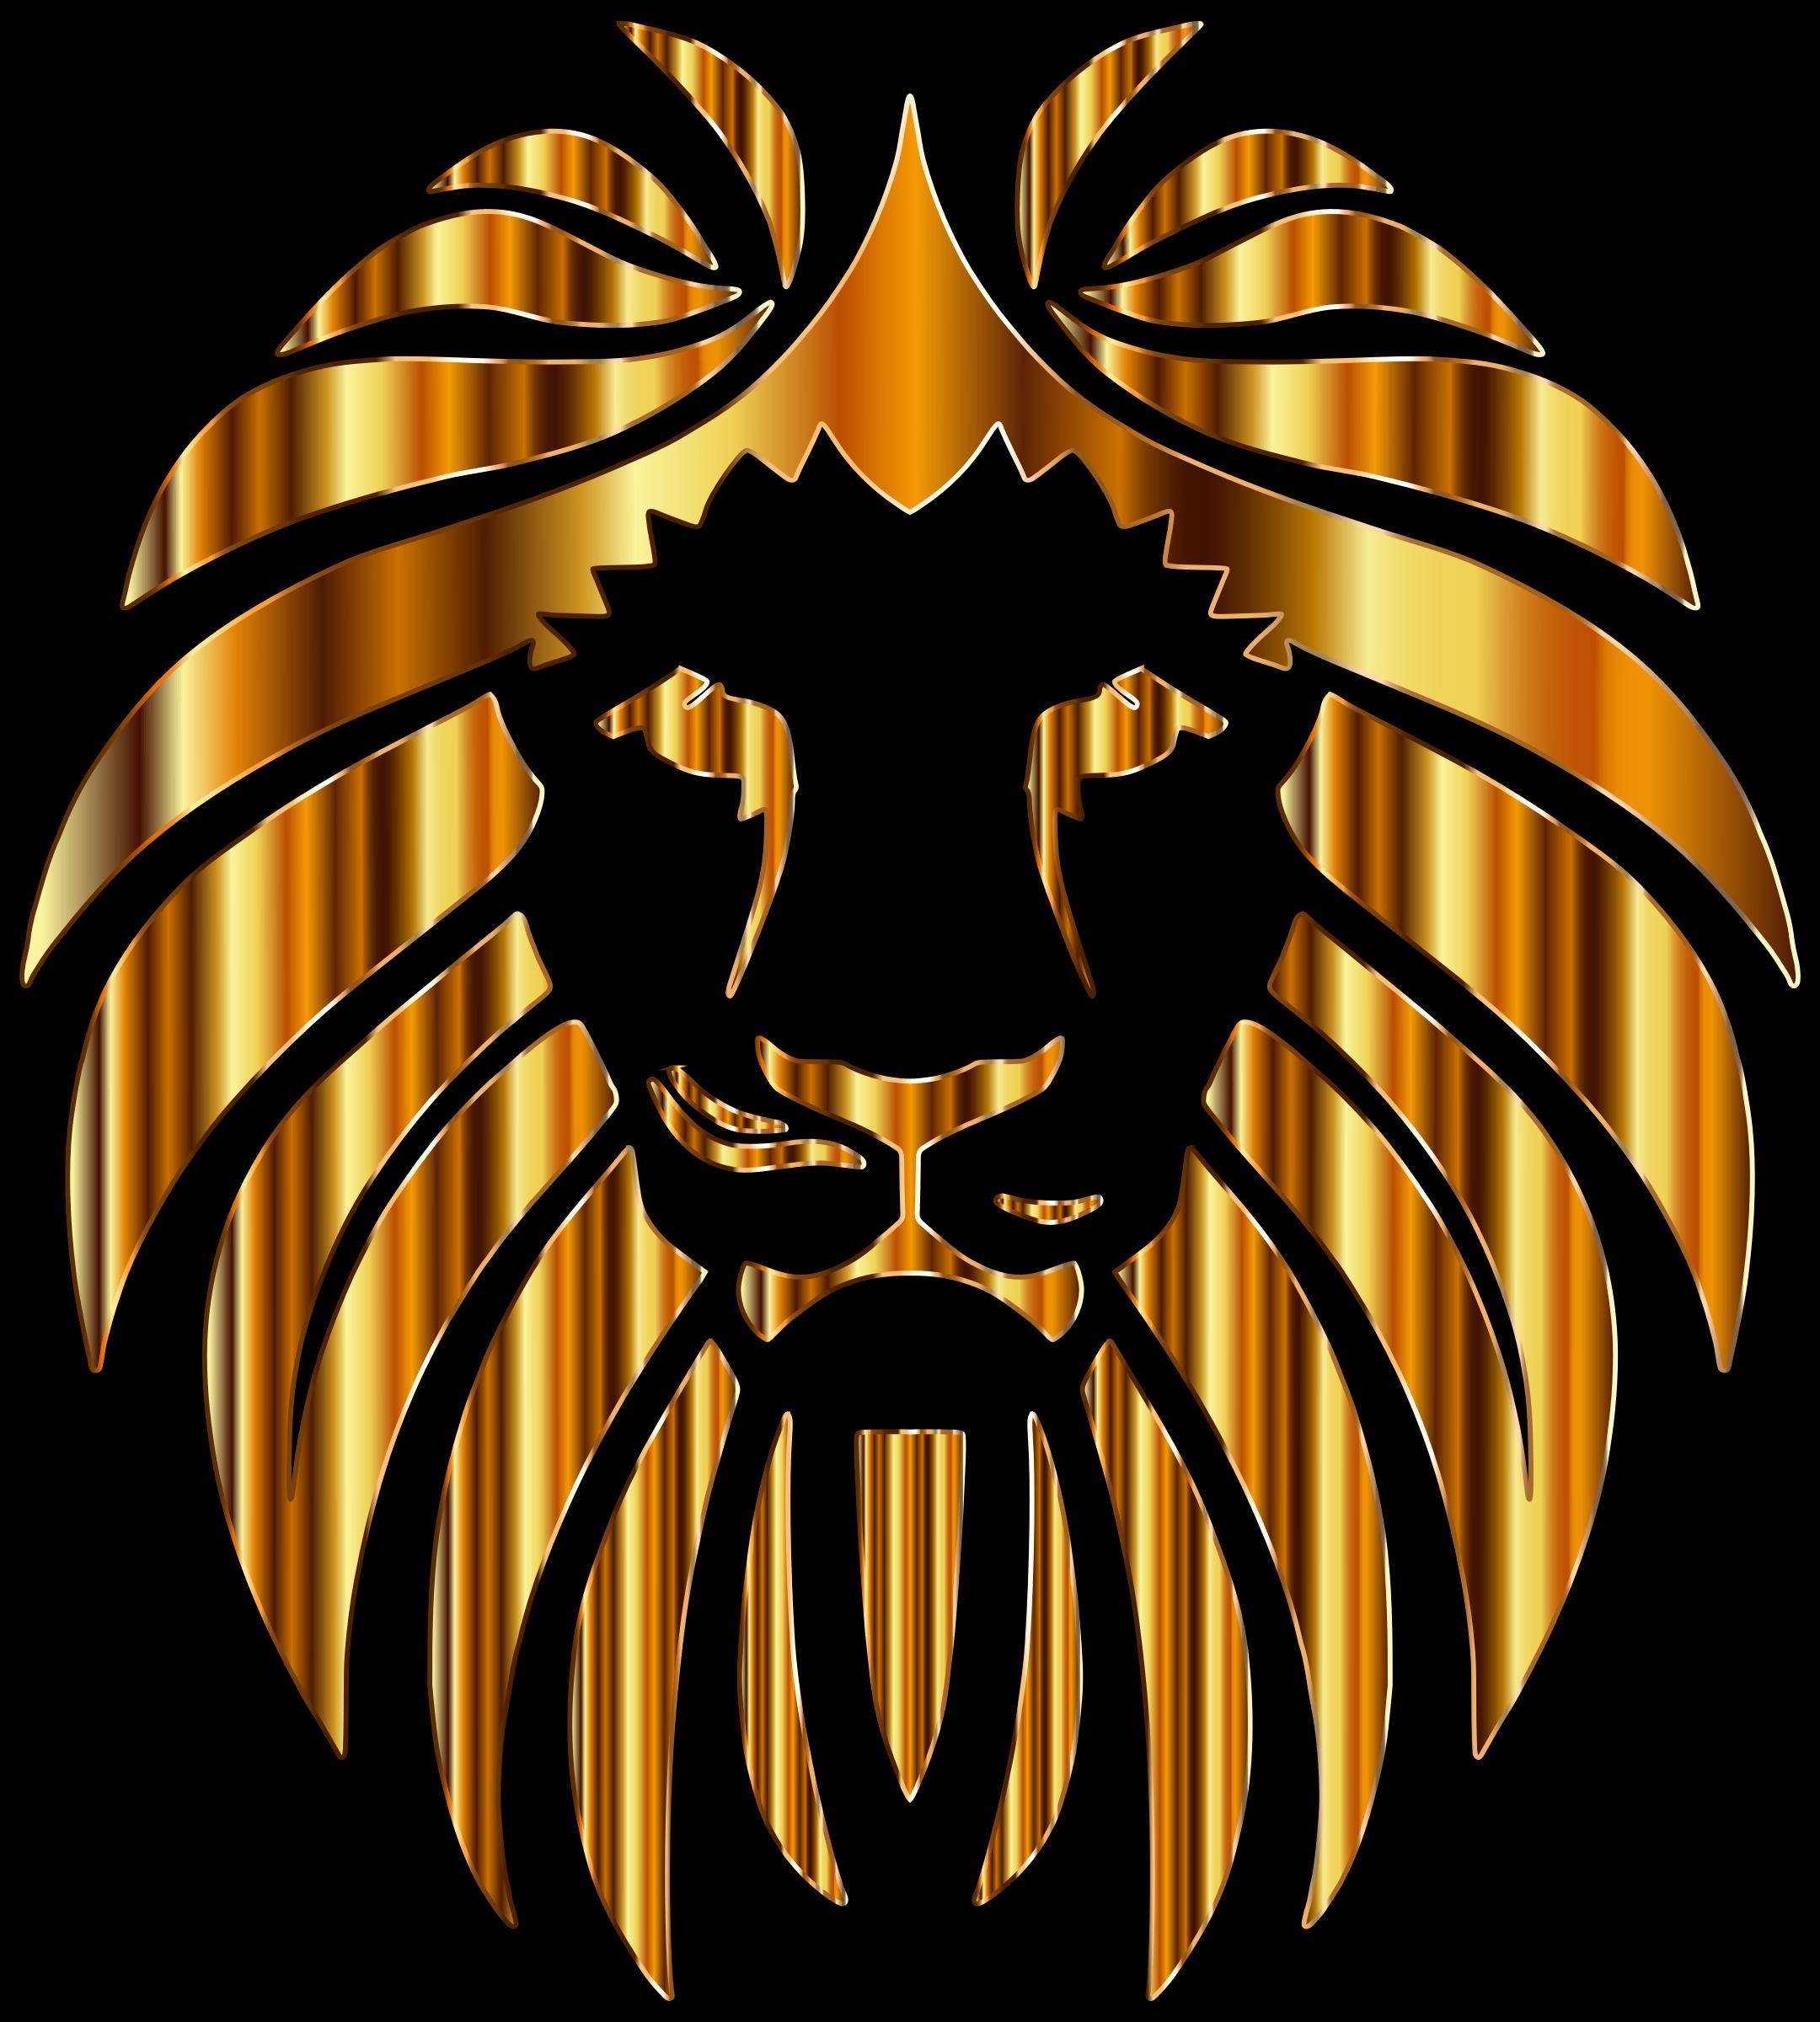 Golden Lion 10 by GDJ Golden Lion Clipart